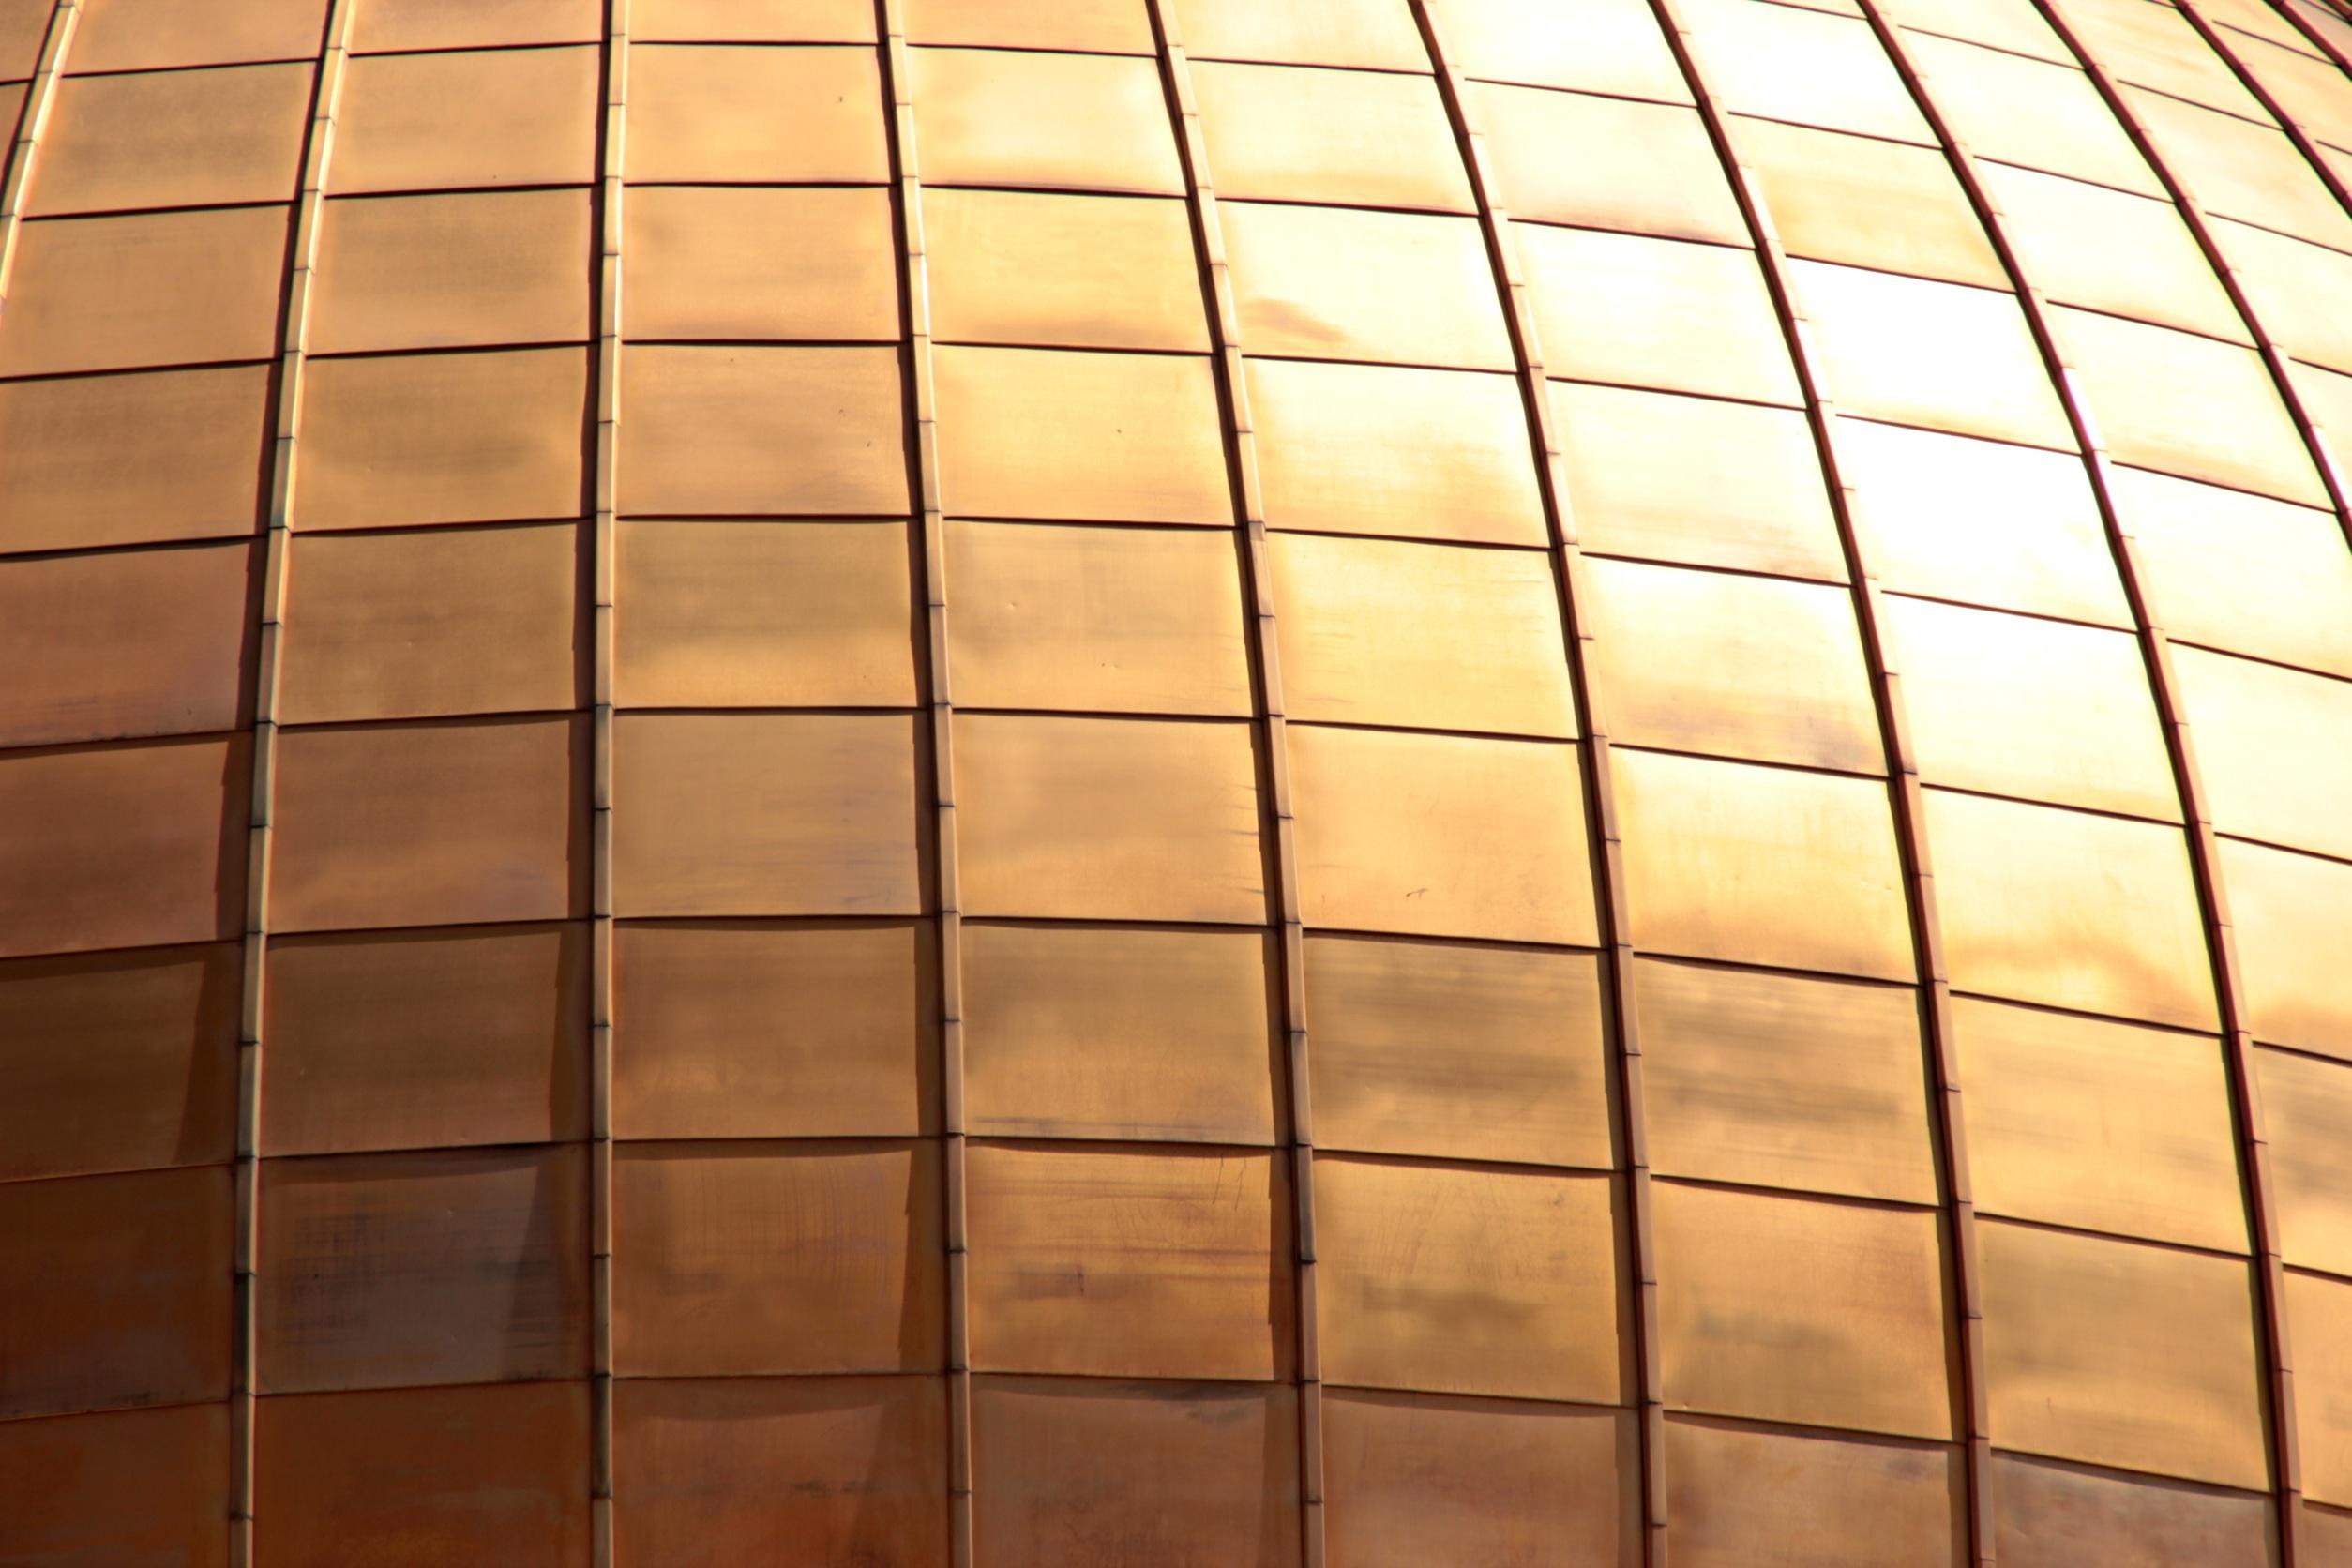 architecture-wood-texture-floor-wall-ceiling-pattern-line-tile-brick-lighting-circle-art-net-squares-symmetry-mosaic-bronze-shape-flooring-daylighting-window-covering-1232574